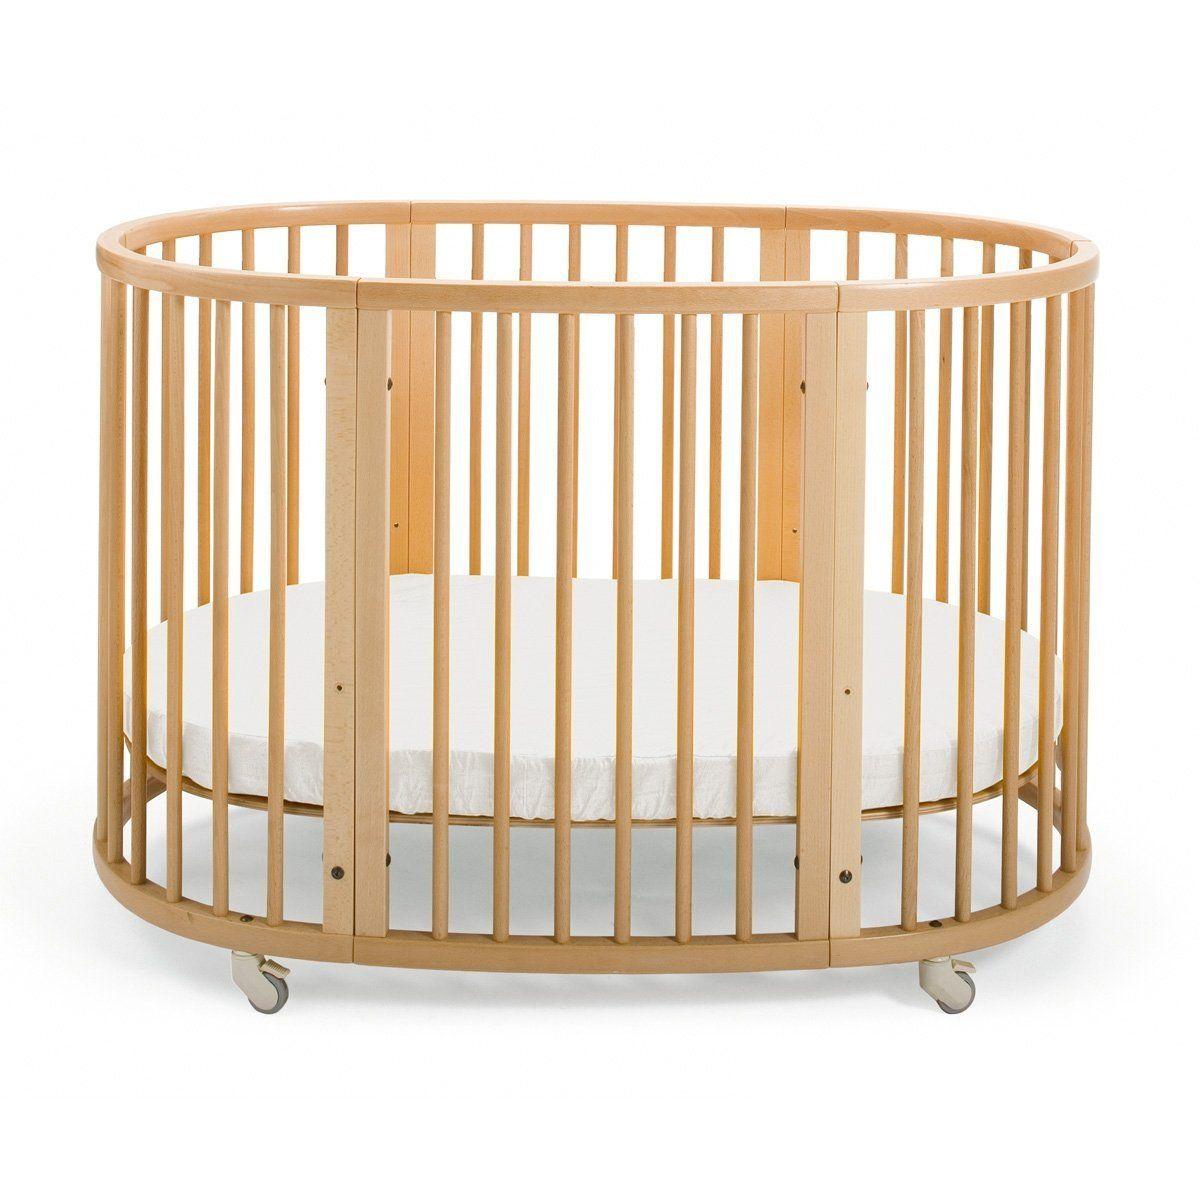 Amazon Com Stokke Sleepi Crib Natural Stokke Sleepi Crib Oval